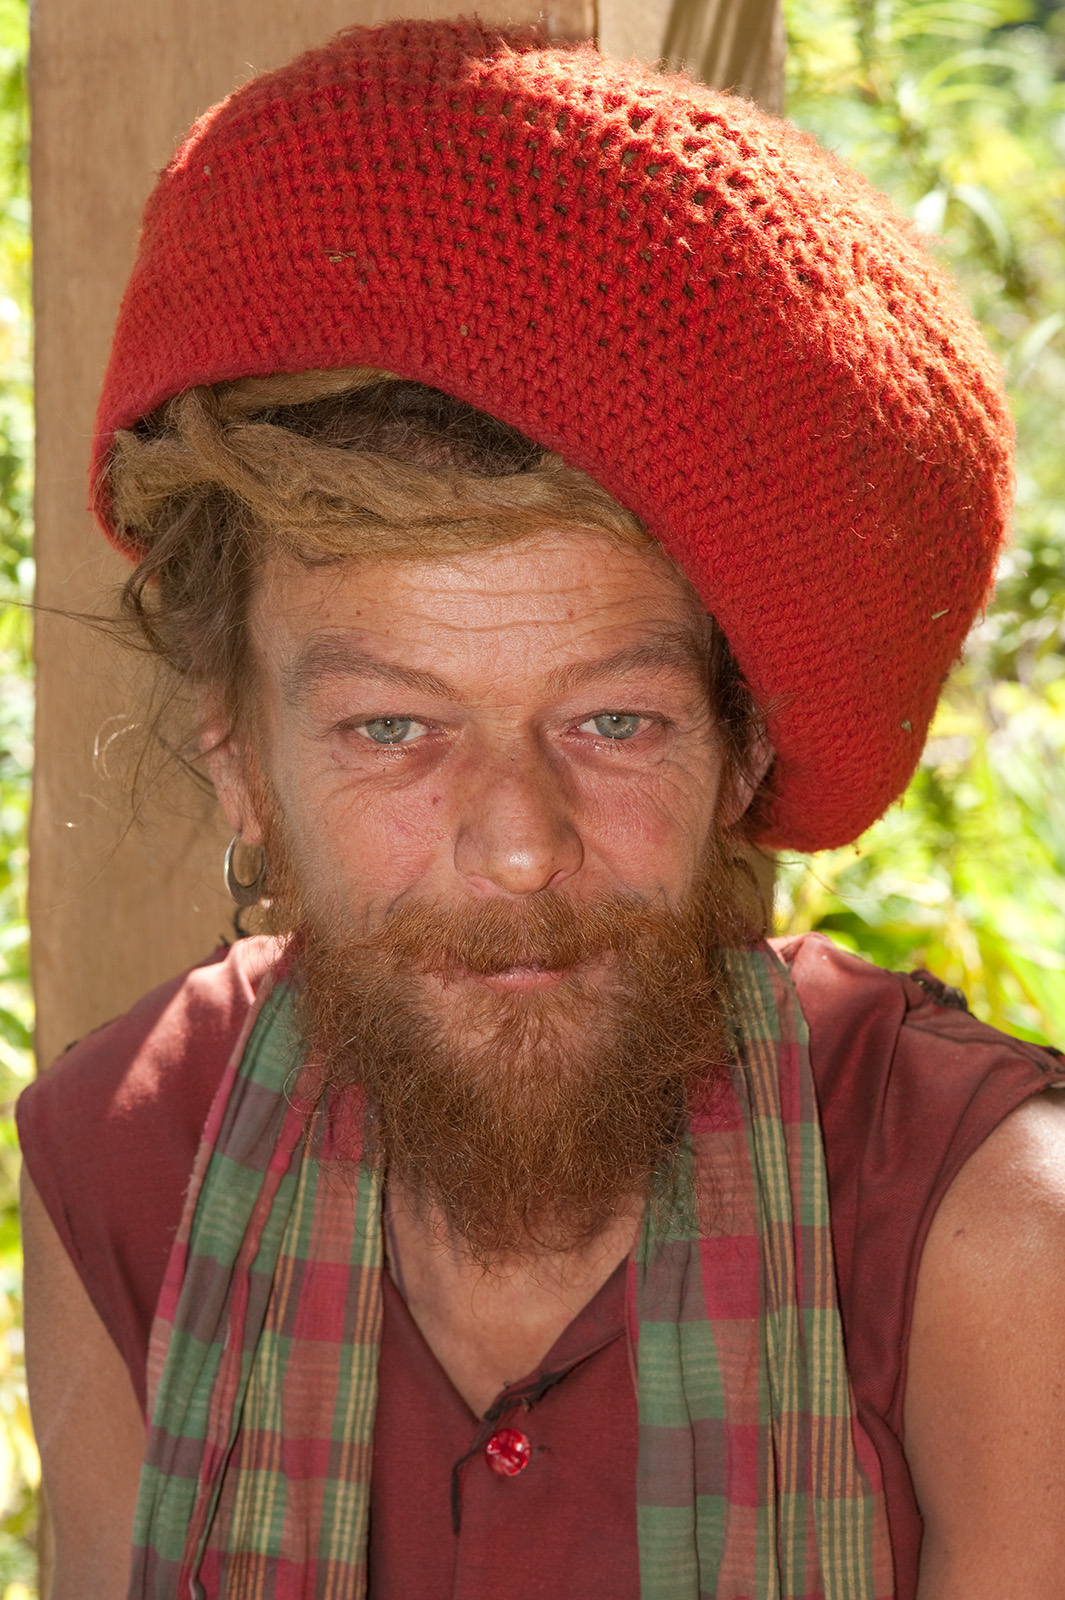 Portraits on the trail to Rees, Uttarakhand, India. Trek Day 21